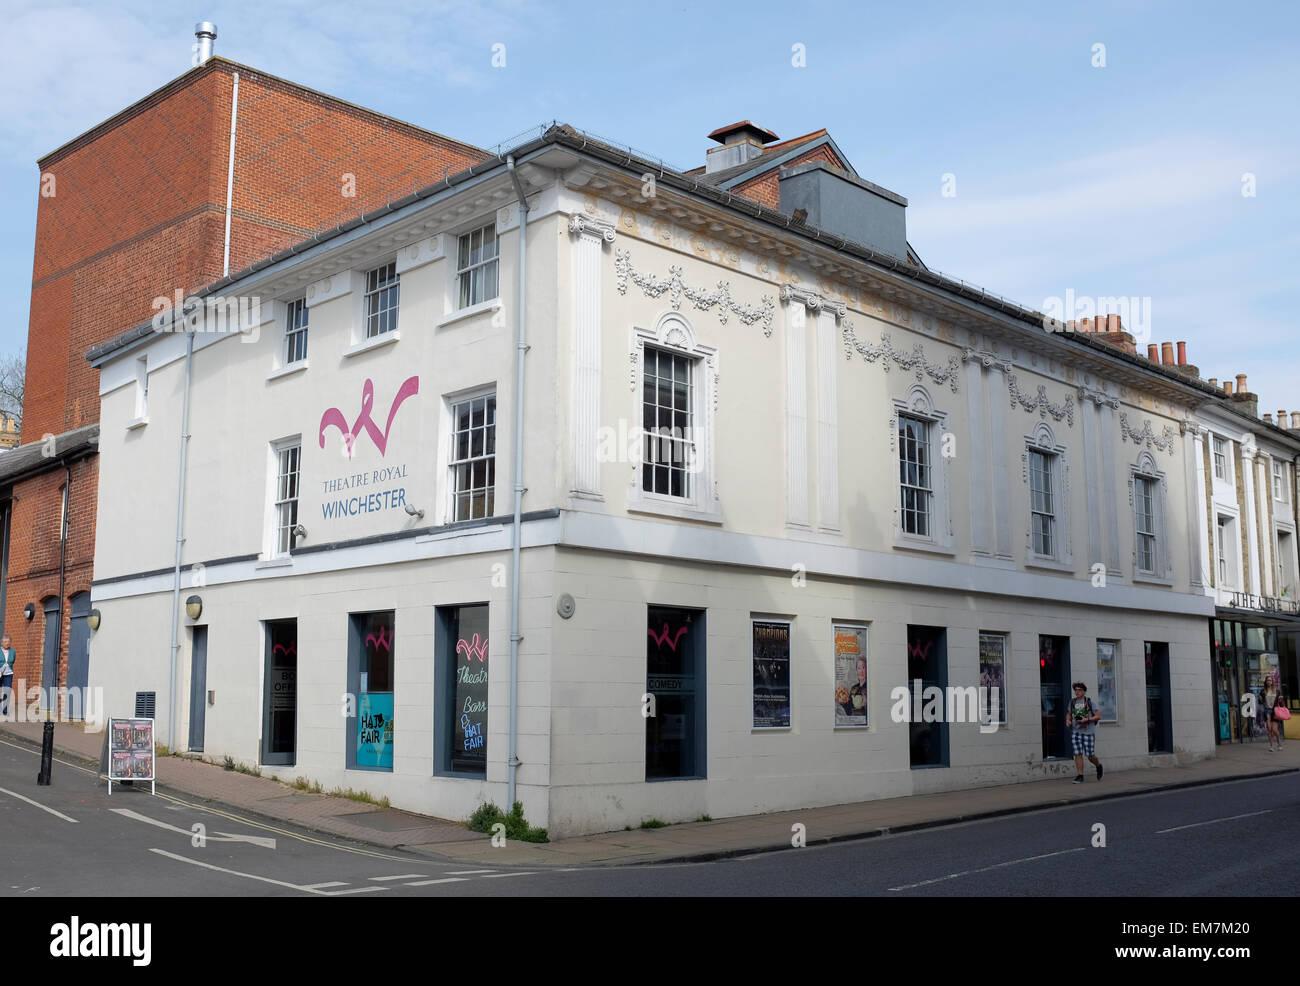 Teatro Royal Jewry Street Winchester Imagen De Stock